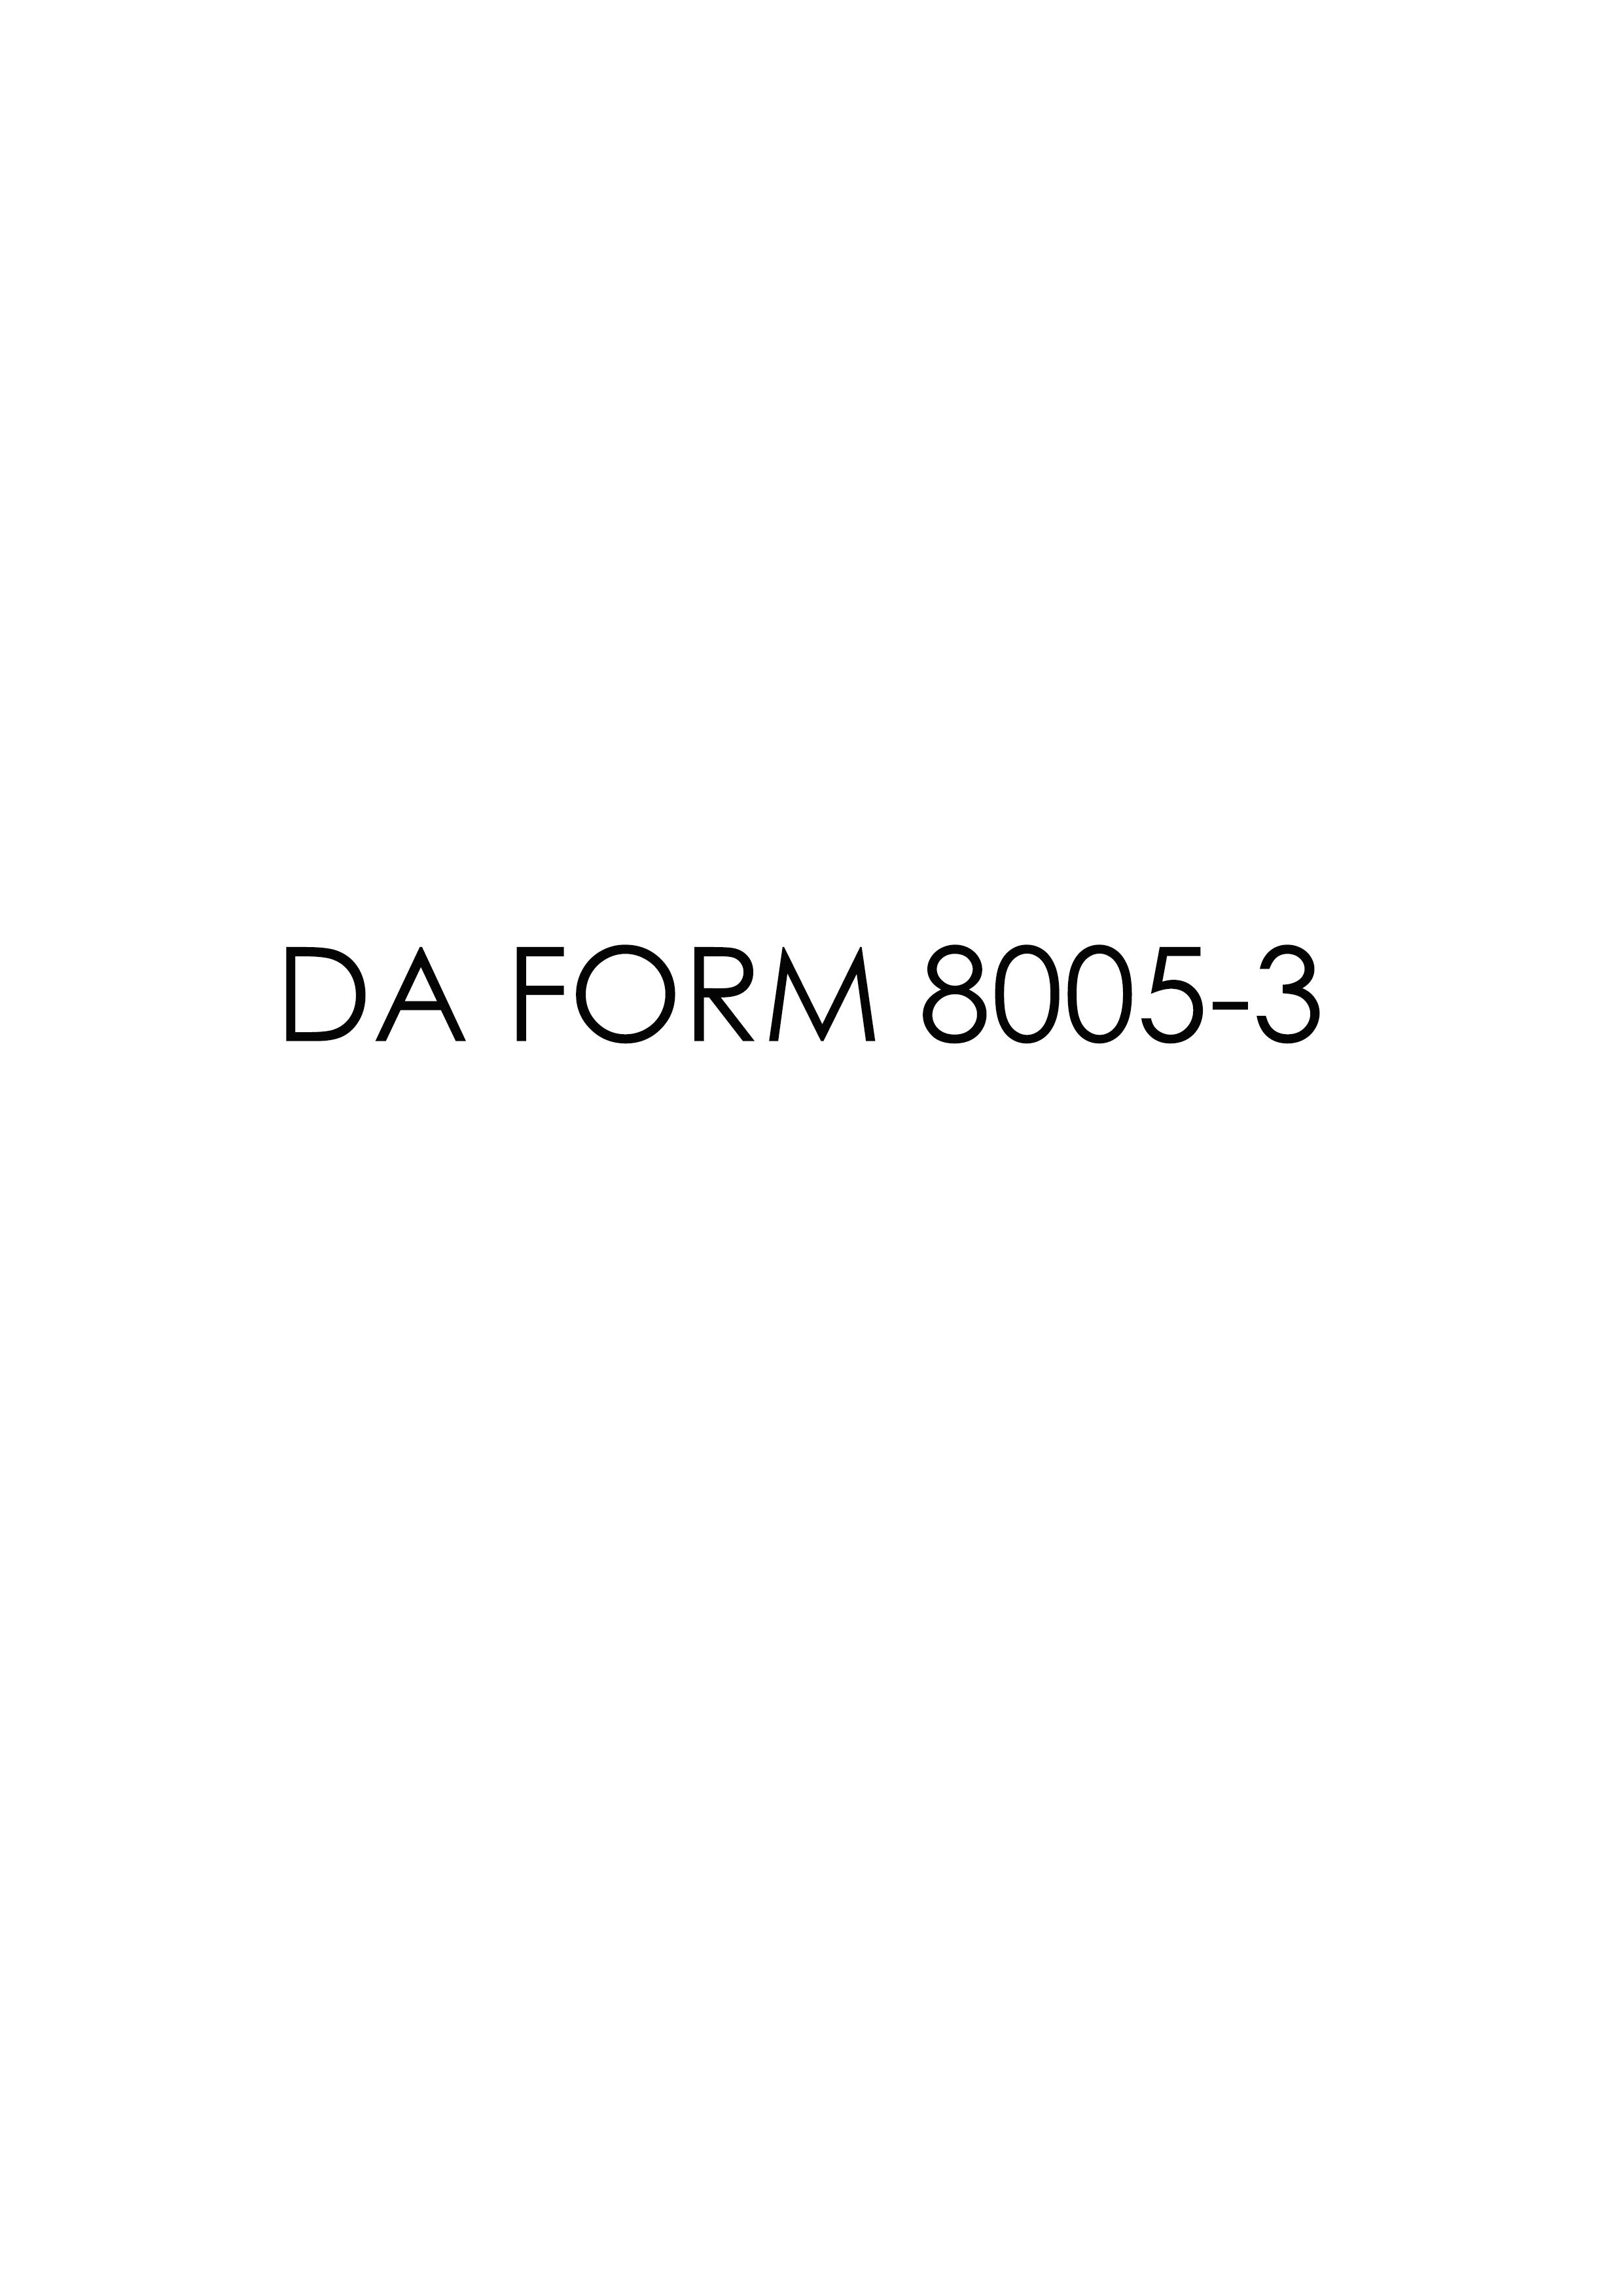 Download da Form 8005-3 Free